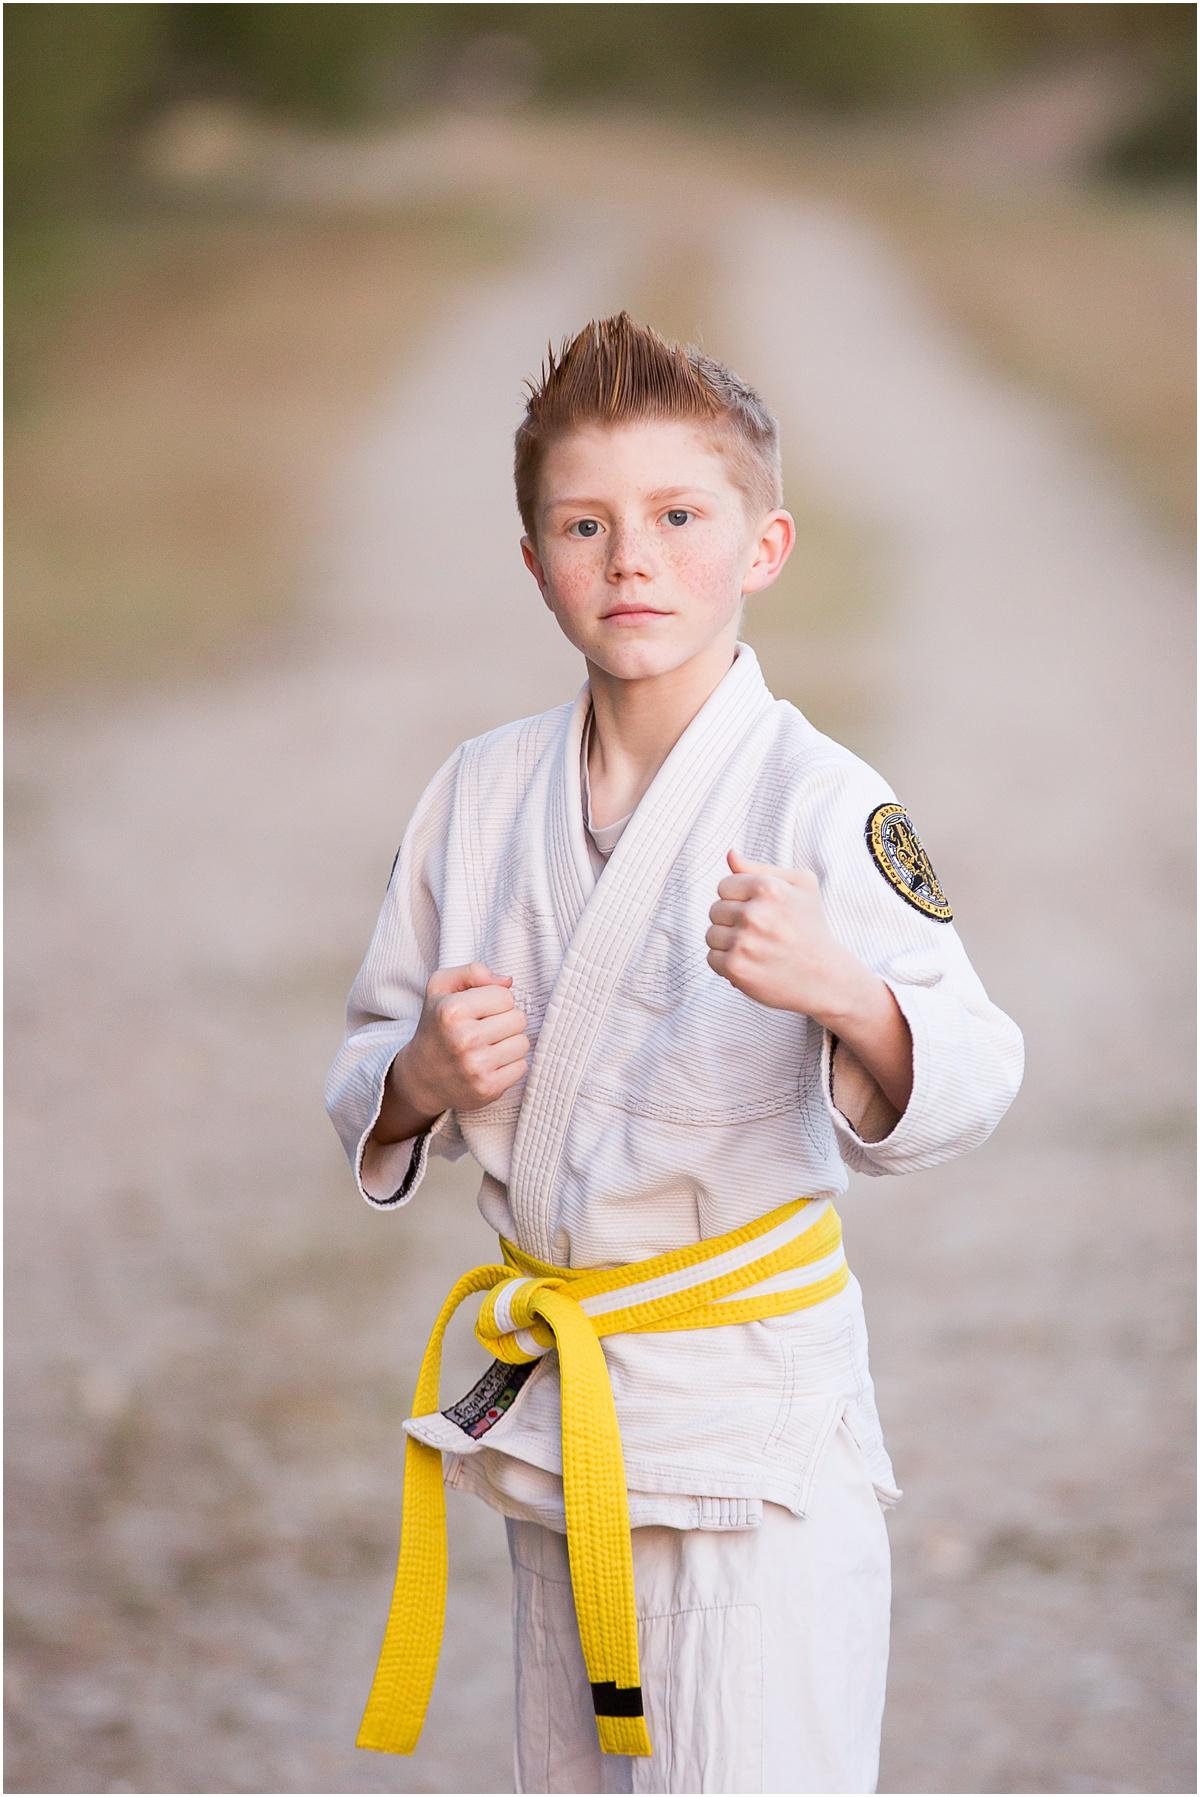 Portraits_Child Photography_Meridian Idaho__Leah Southwick Photography_0061.jpg